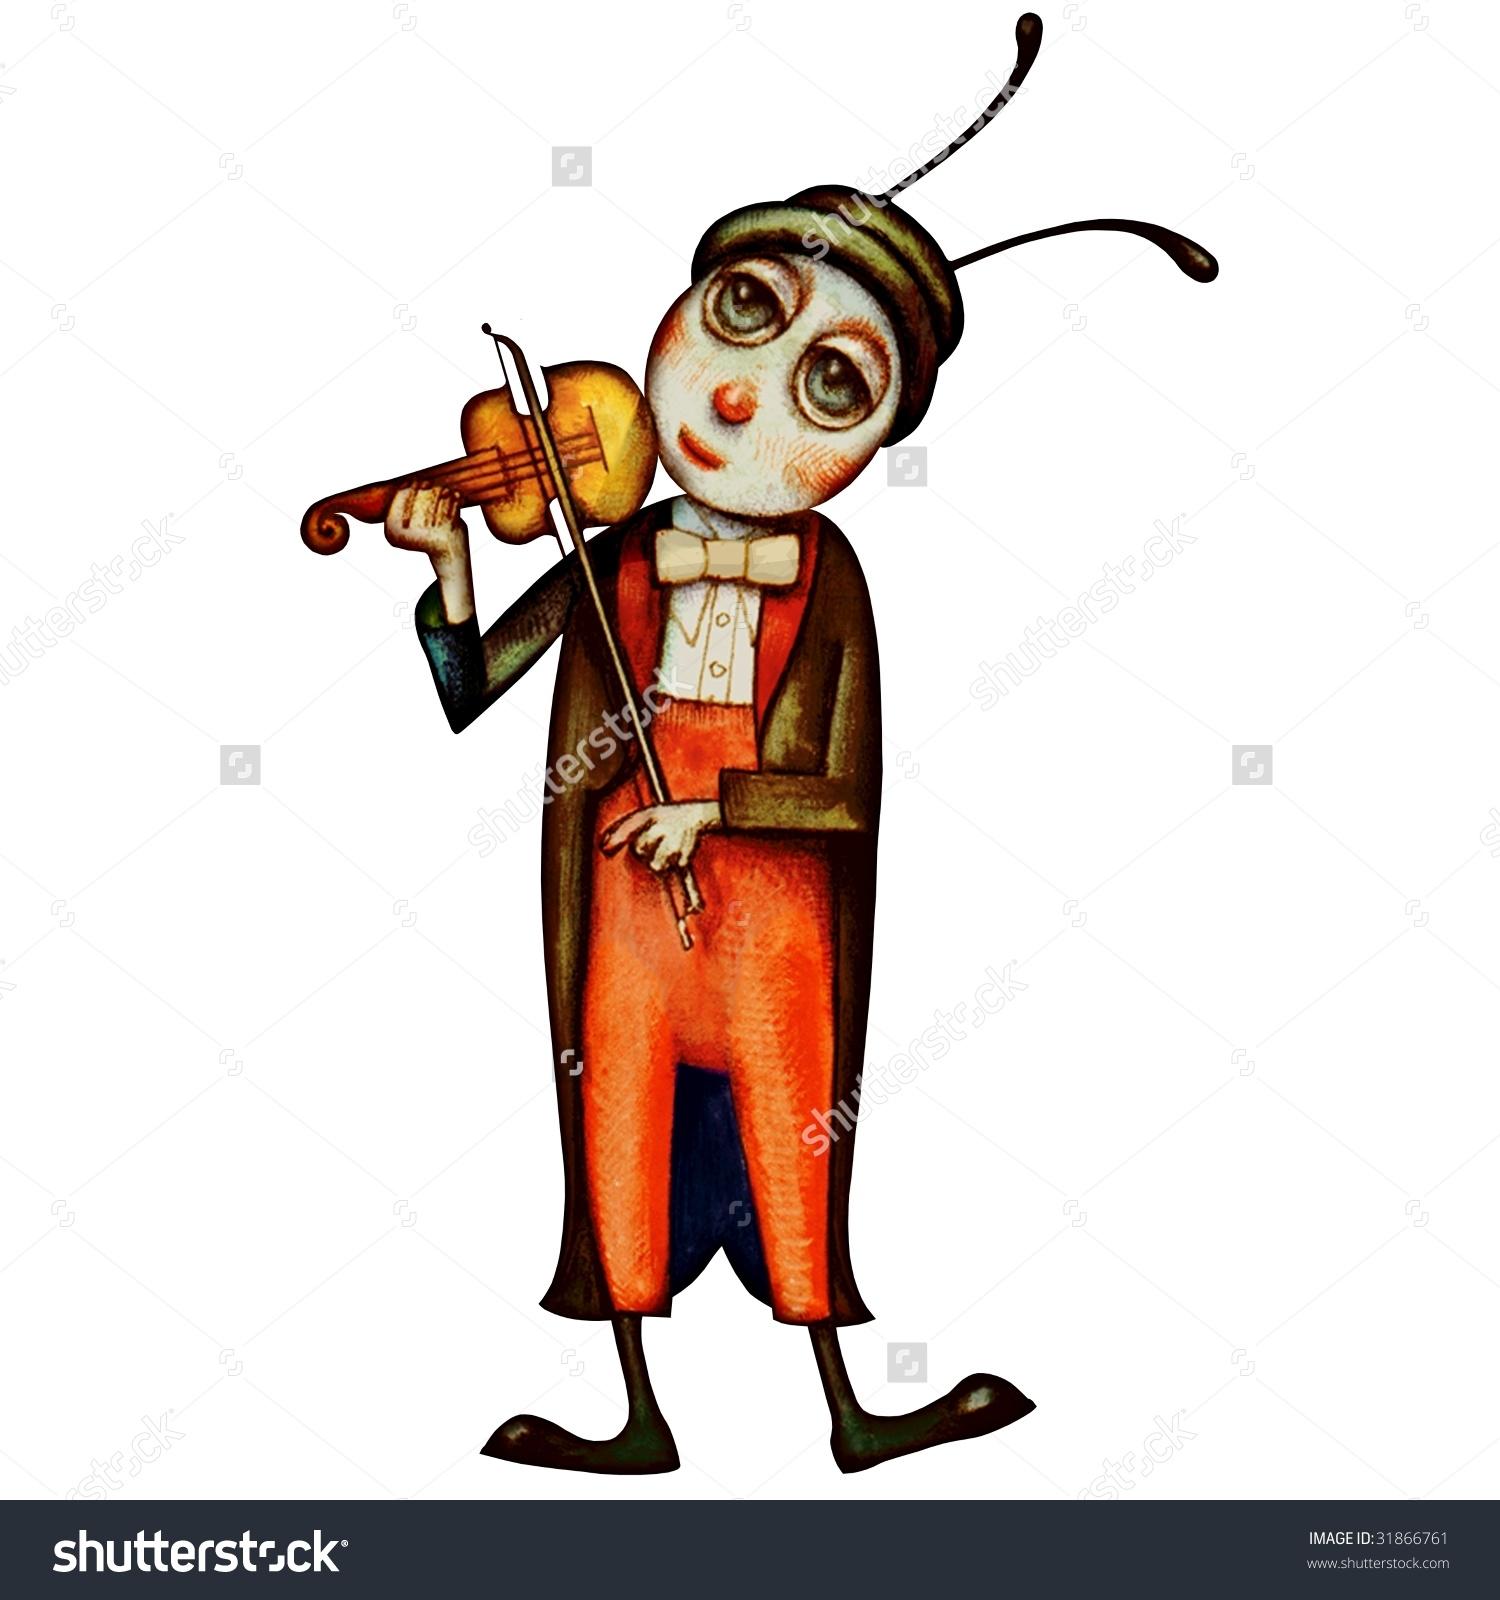 Cricket clipart singing #4